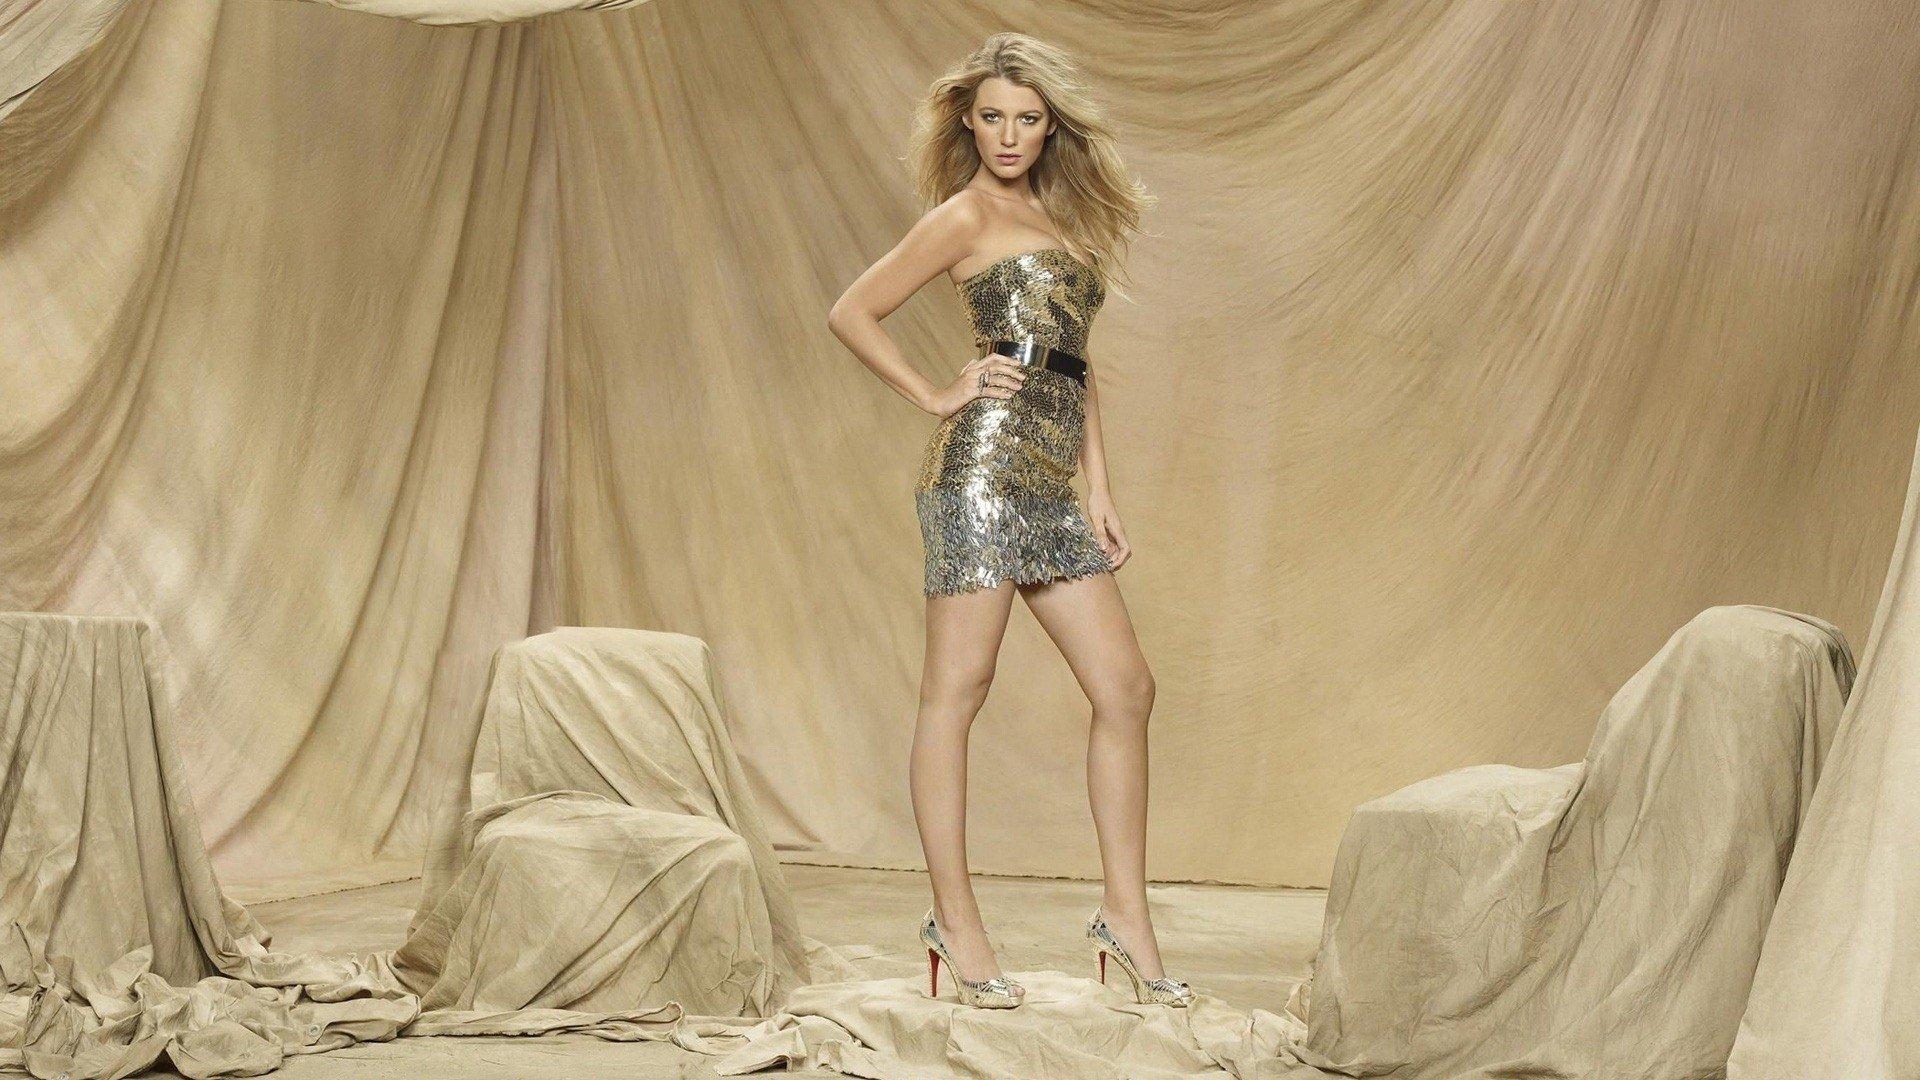 Wallpaper Blake Lively as Serena Van der Woodsen